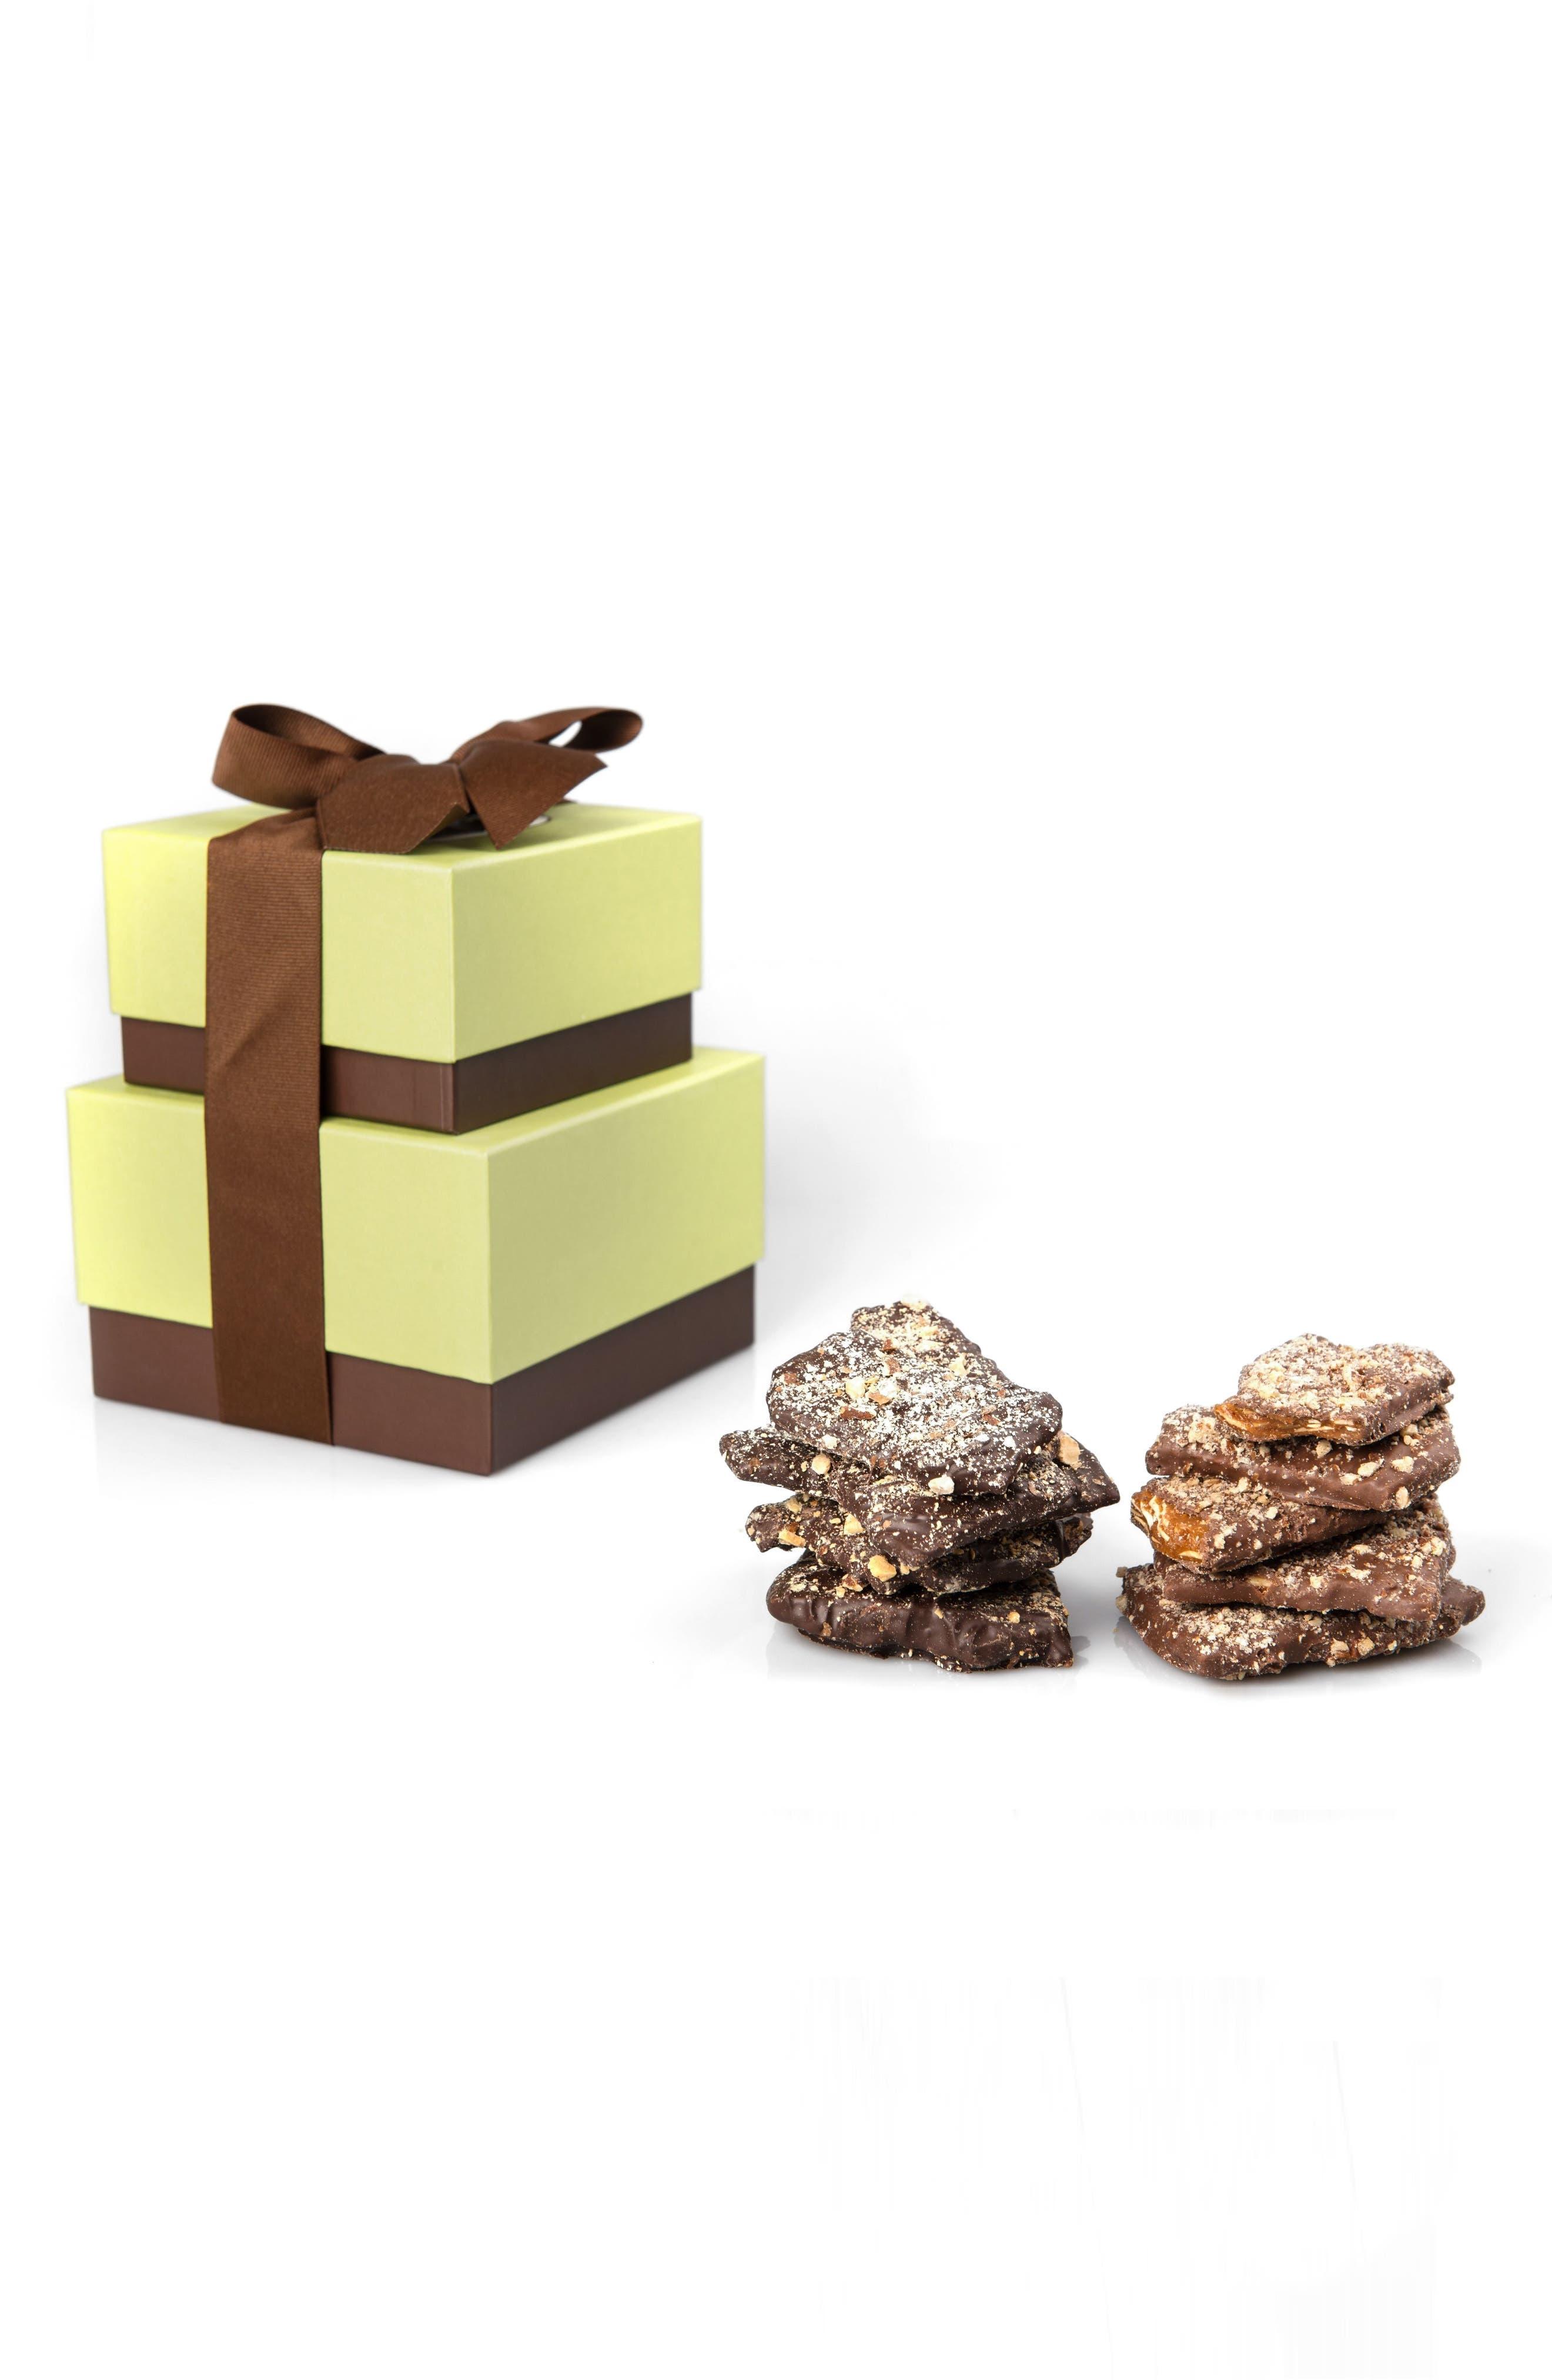 Dark Chocolate Almond & Milk Chocolate Pecan Toffee Tower,                             Main thumbnail 1, color,                             100